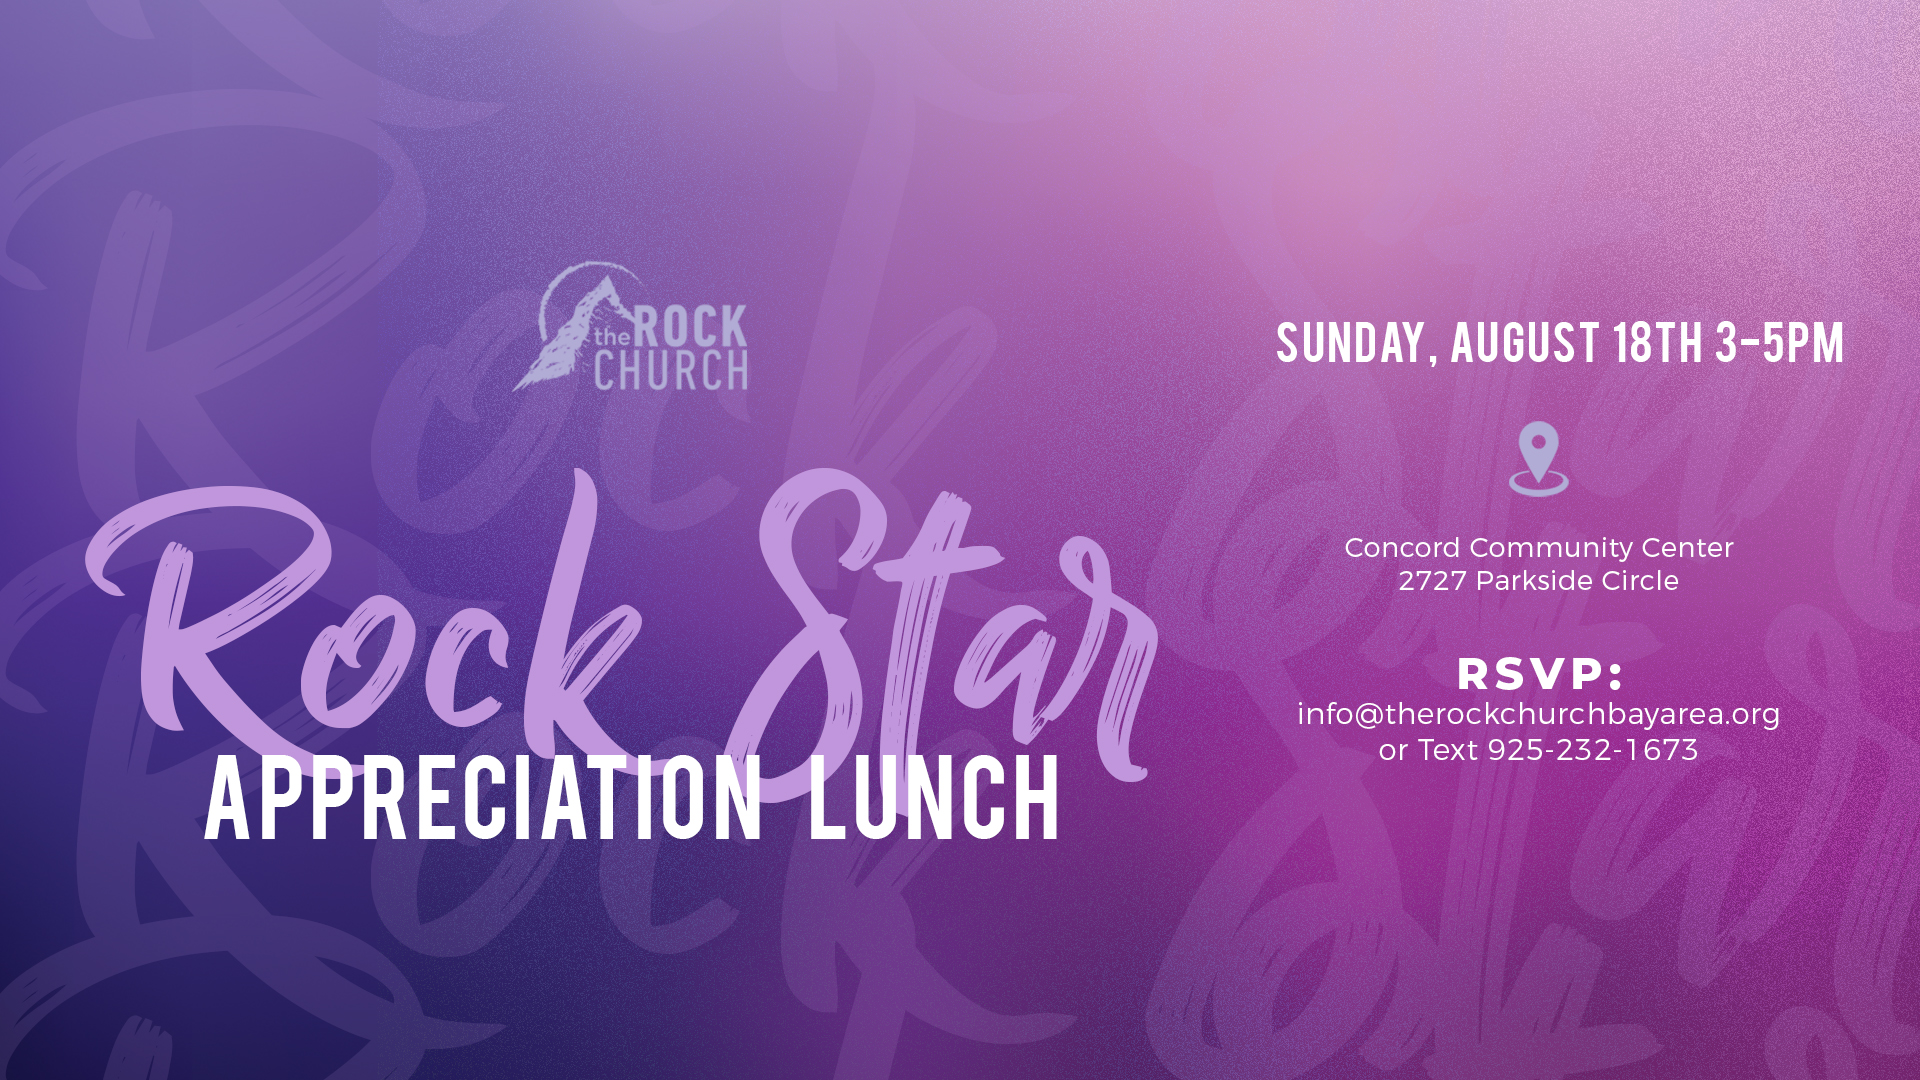 Rock Star lunch hd.jpg